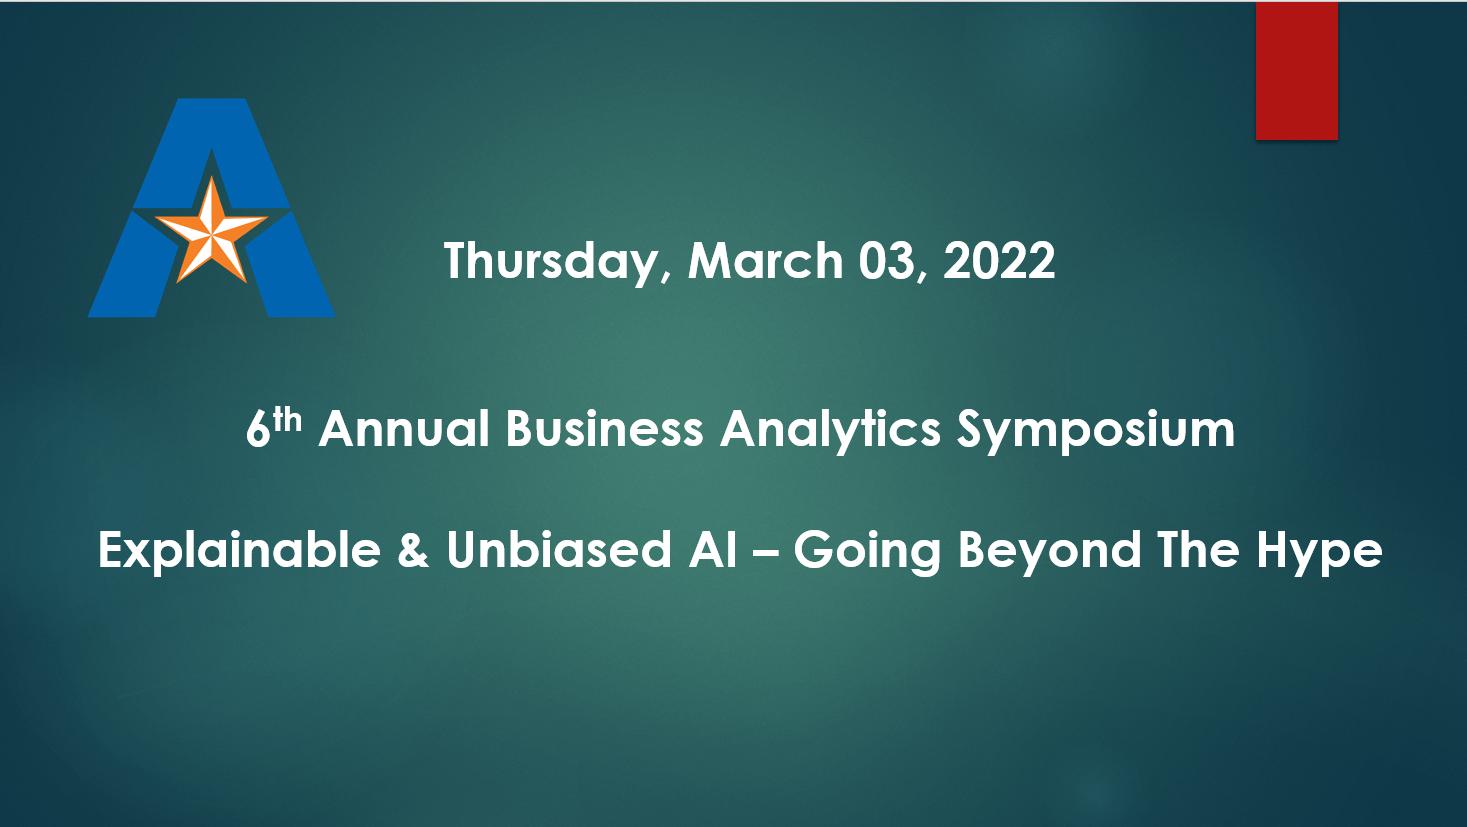 6th Annual Business Analytics Symposium Icon